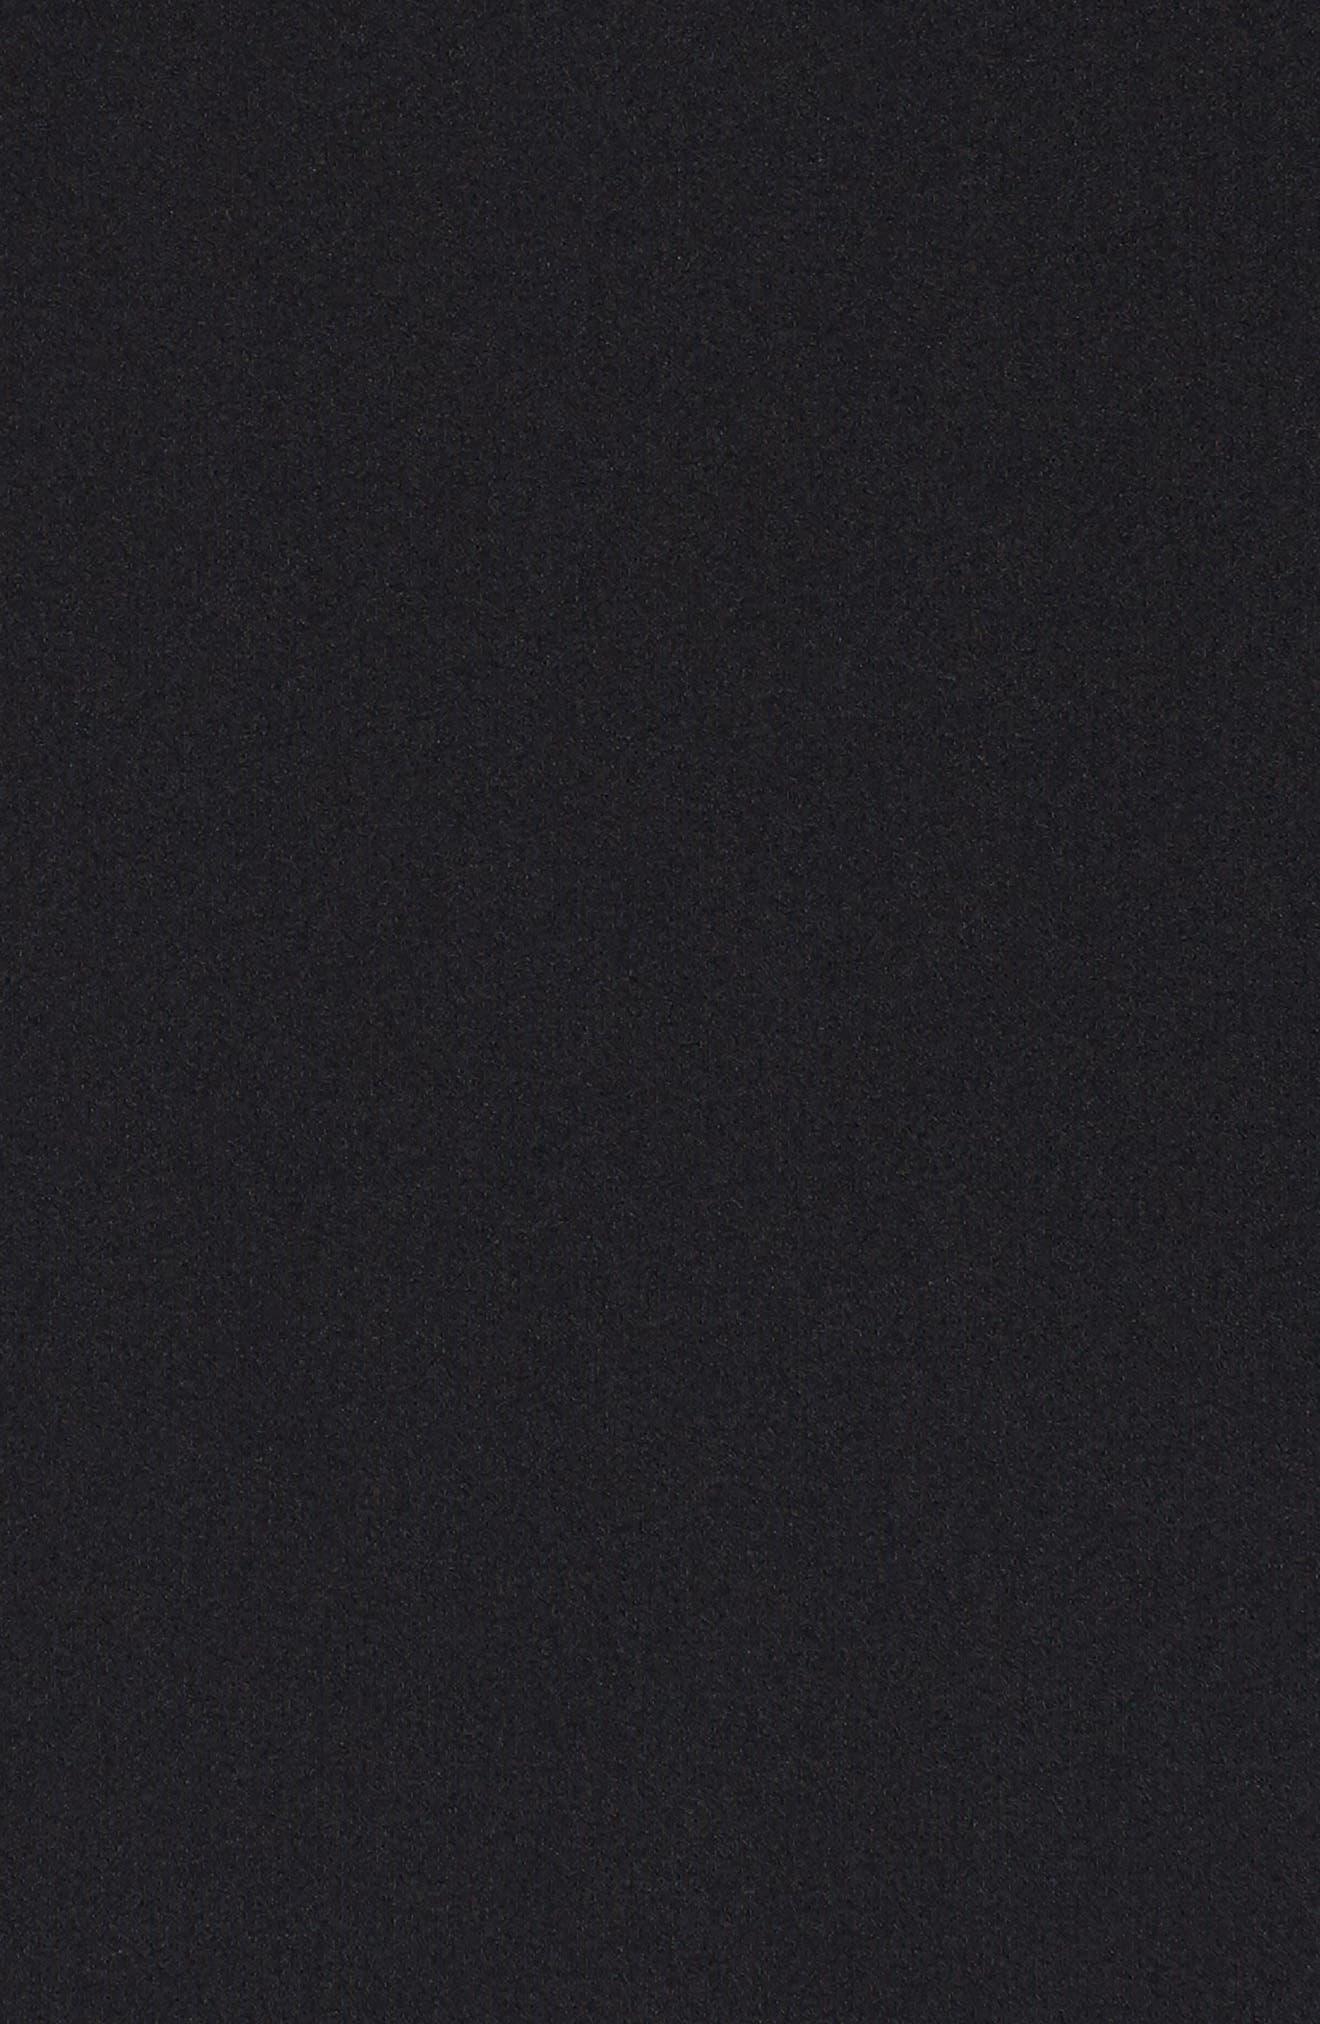 Tekno Pullover Hoodie,                             Alternate thumbnail 6, color,                             TNF BLACK